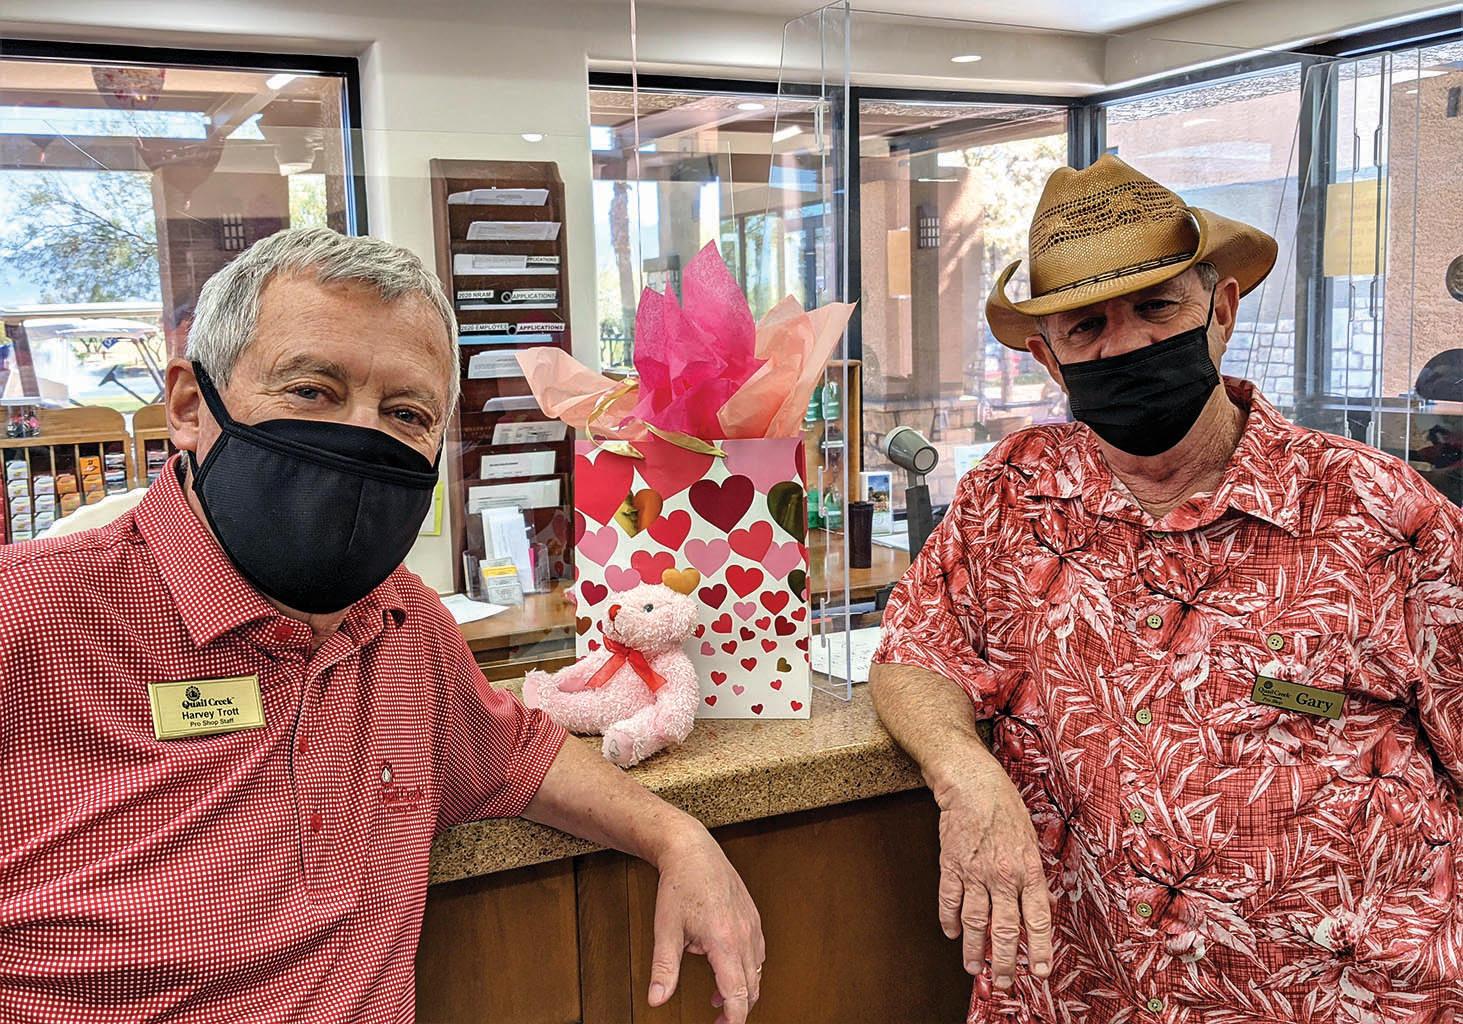 Pro Shop staff Harvey Trott and Gary Adkins